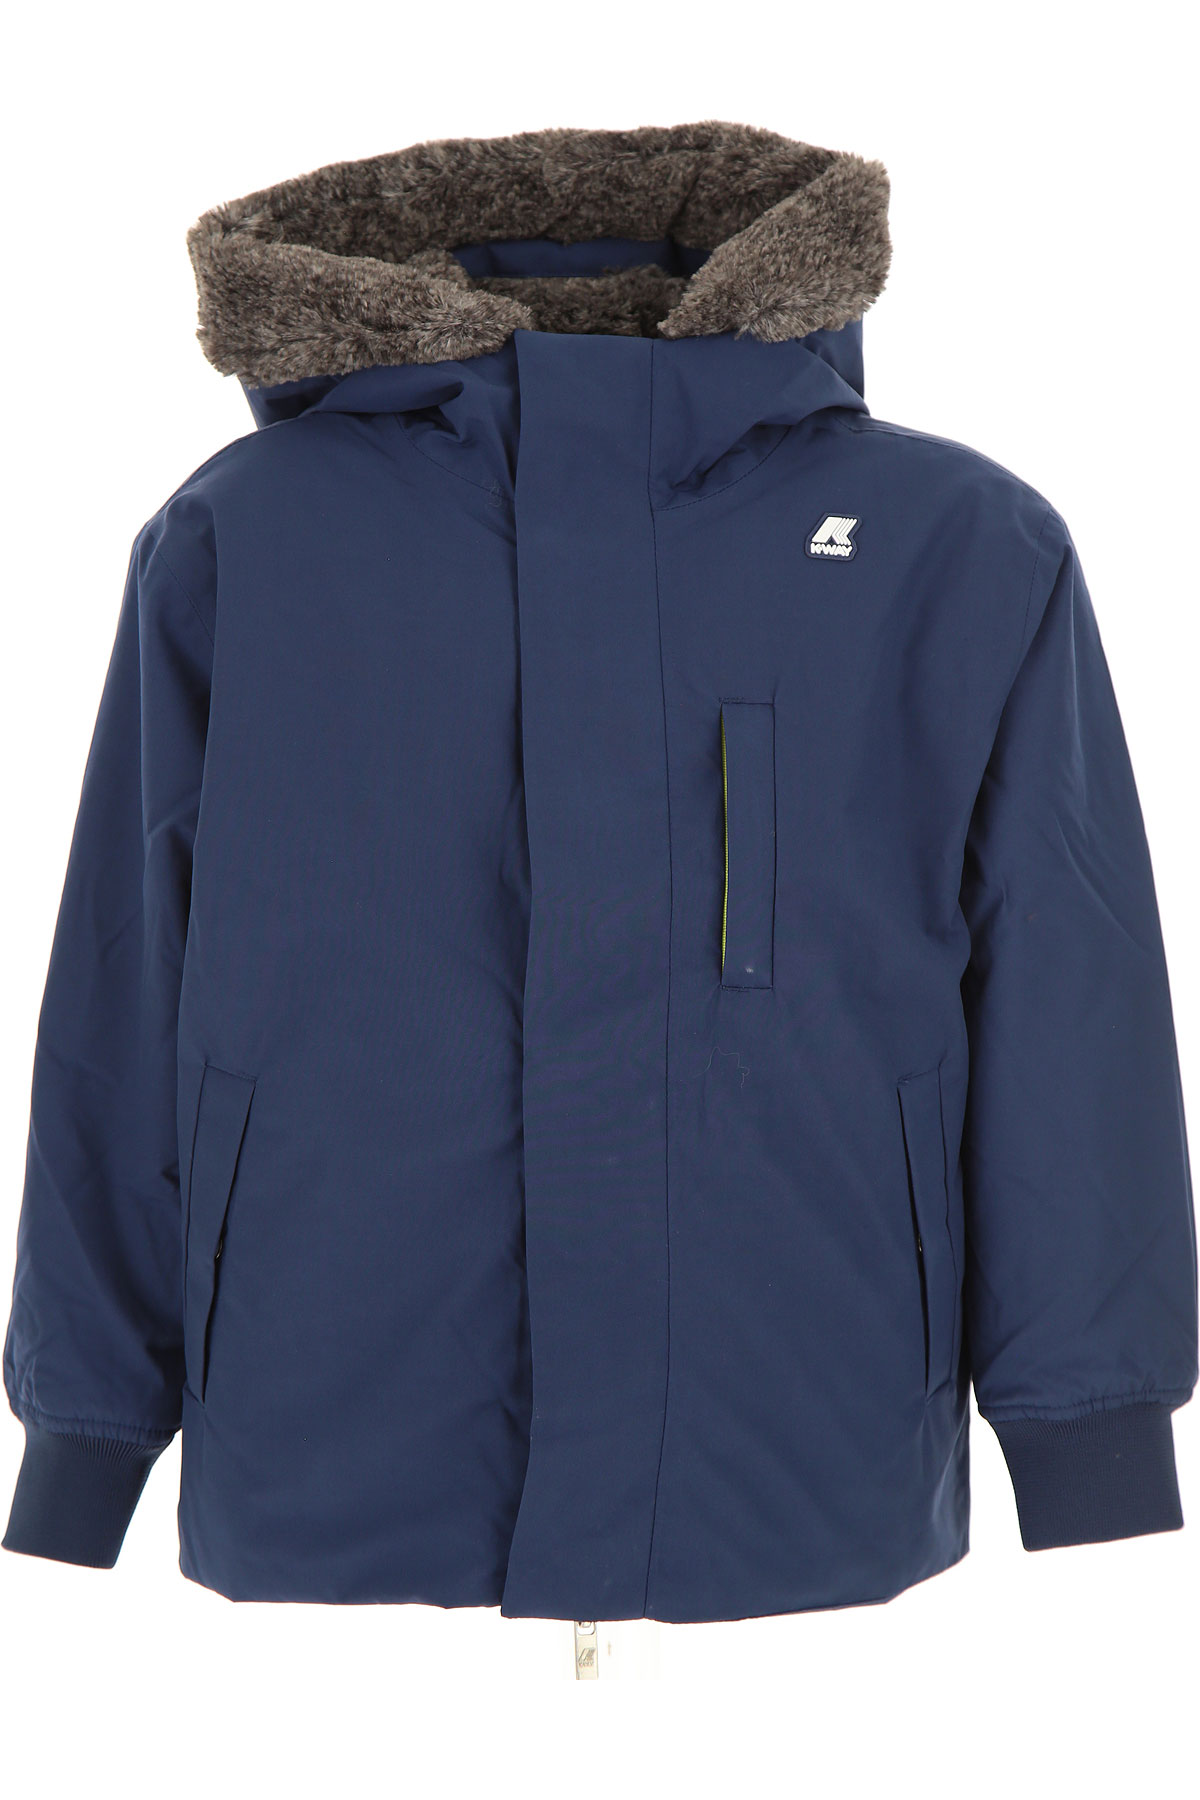 K-Way Boys Down Jacket for Kids, Puffer Ski Jacket On Sale, Indigo Blue, Cotton, 2019, 10Y 8Y